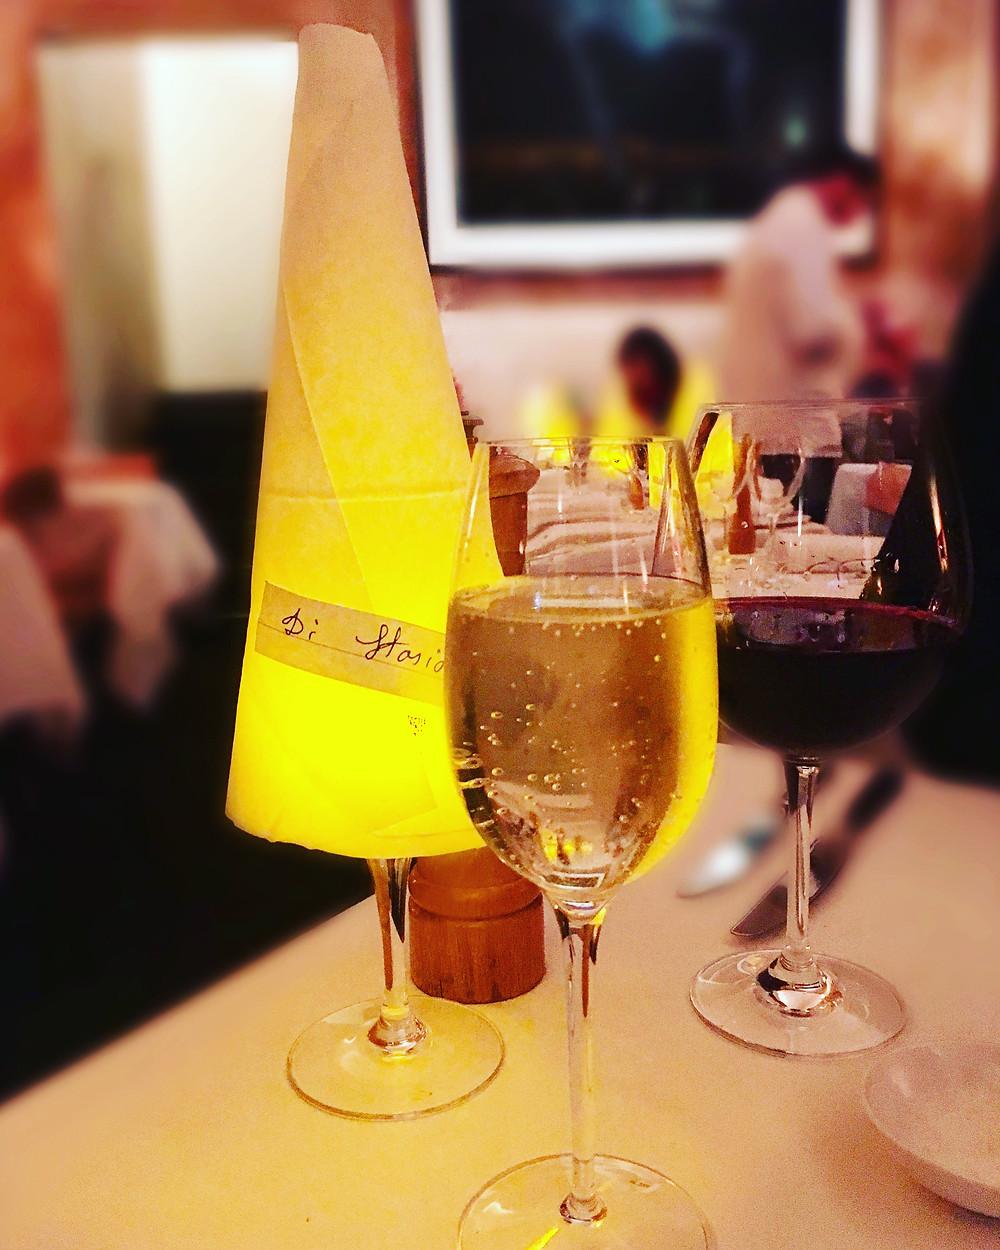 Cafe Di Stasio | wines